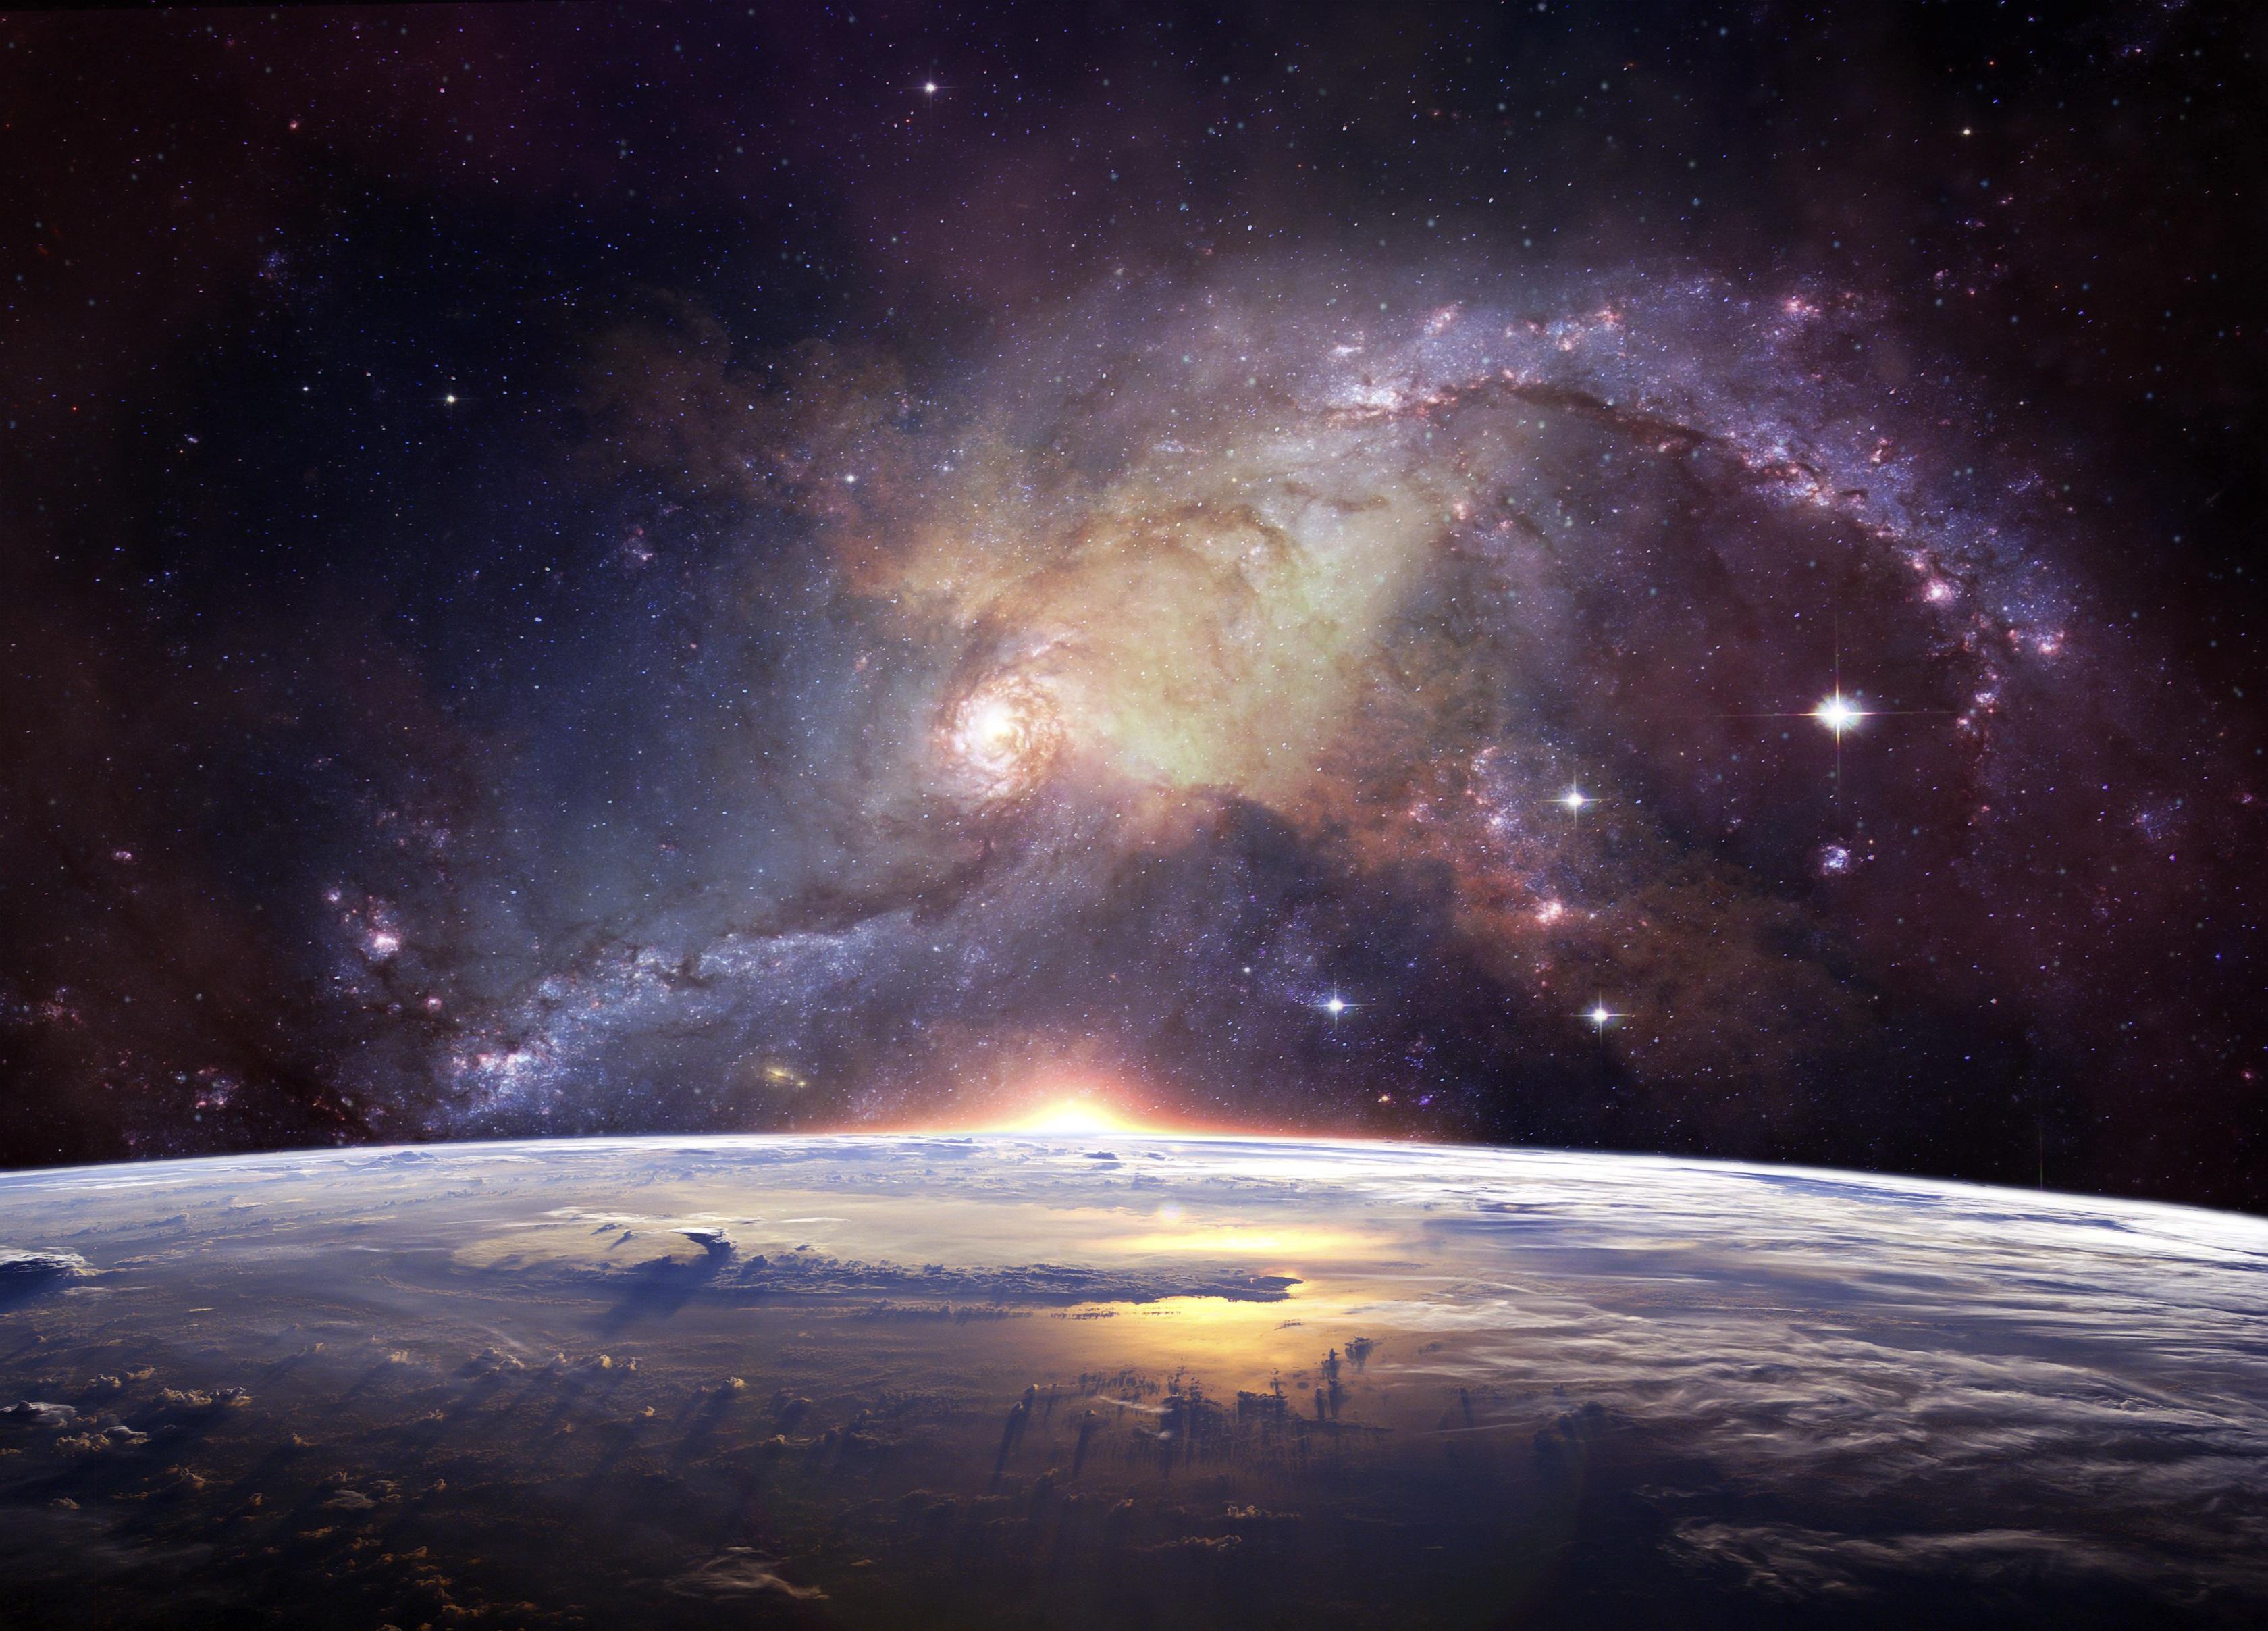 Galaxy Planetscape Space Stars 3359x2415